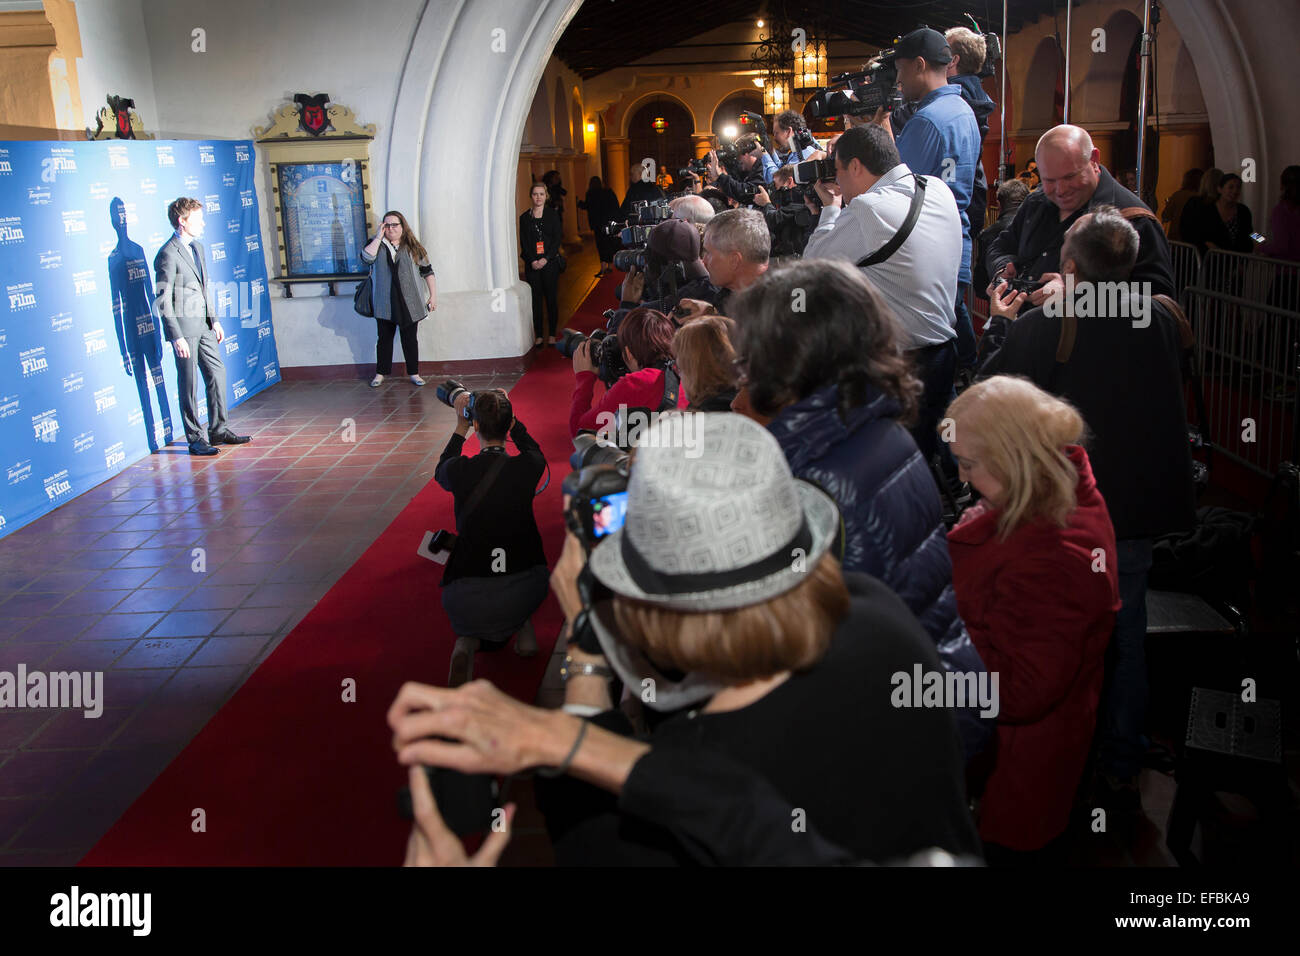 Santa Barbara, California, USA. 29th Jan, 2015. Eddie Redmayne poses for photos on the red carpet at the 30th Santa - Stock Image